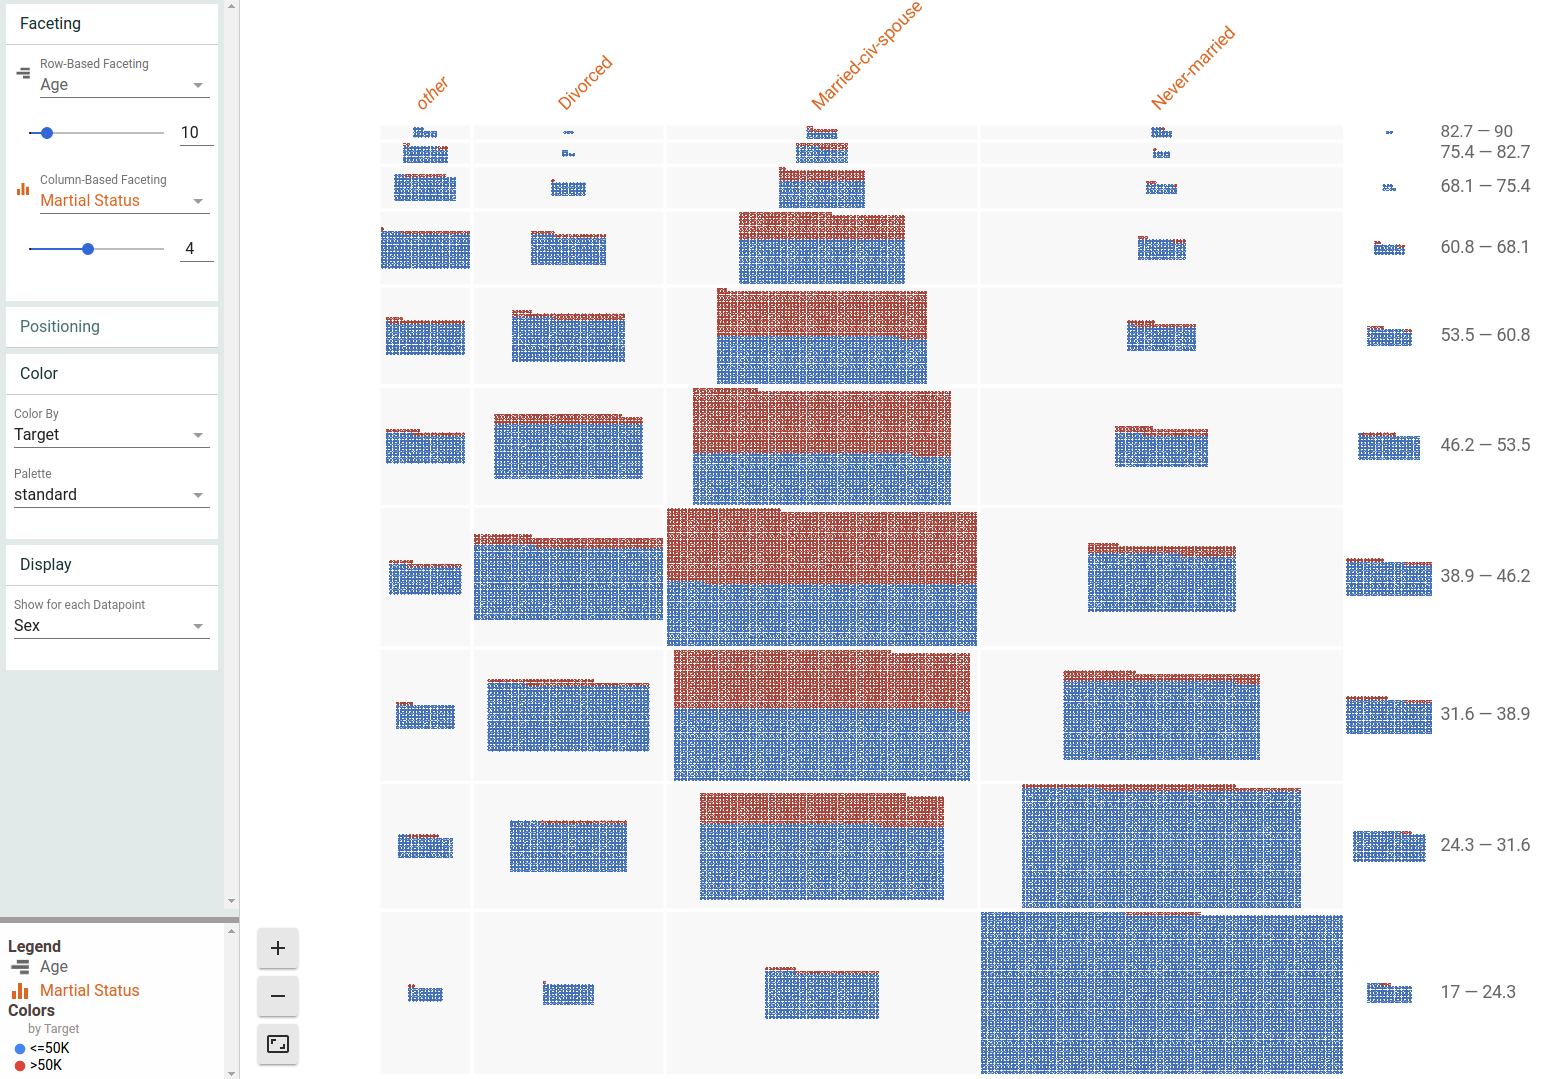 Dive visualization of UCI census data